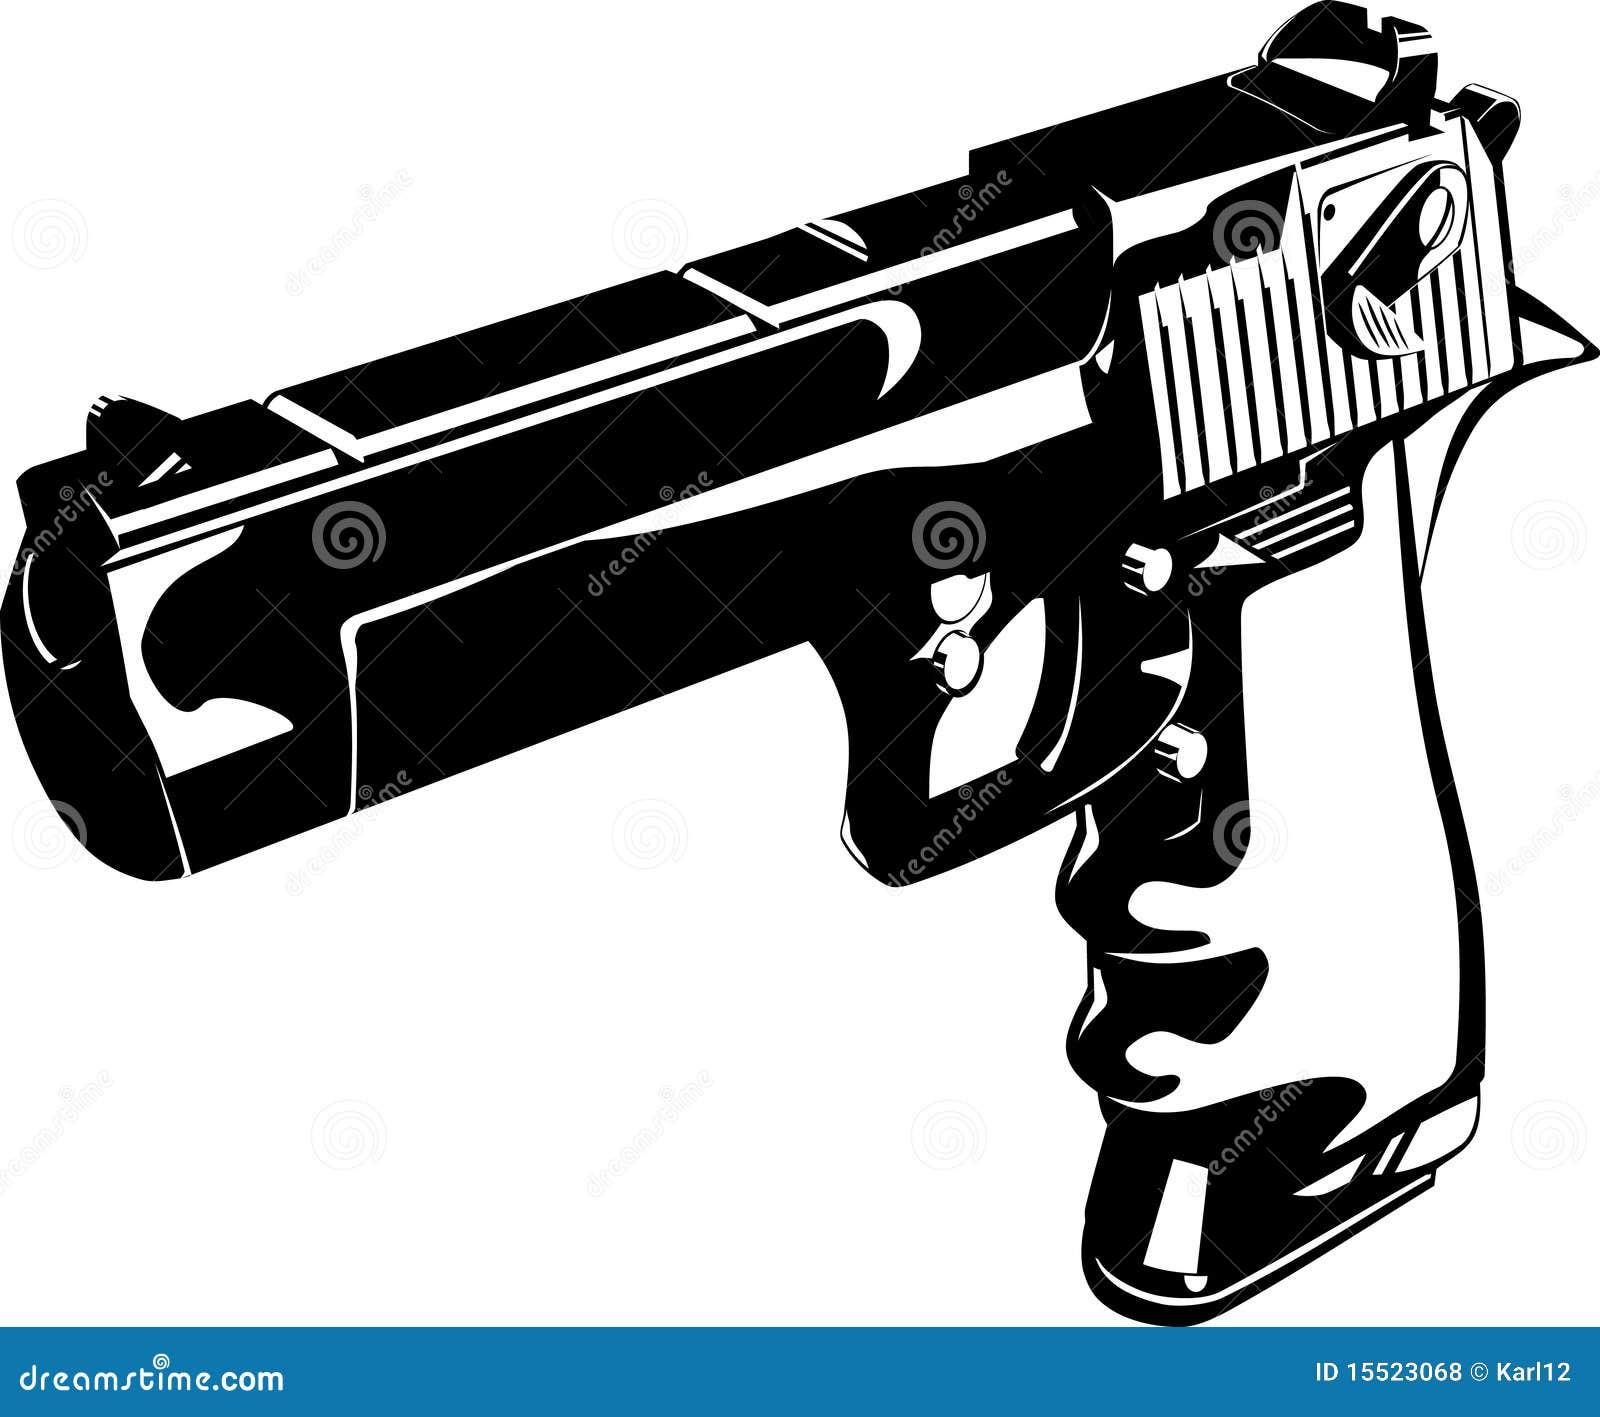 Gun Black And White Royalty Free Stock Photos - Image: 15523068